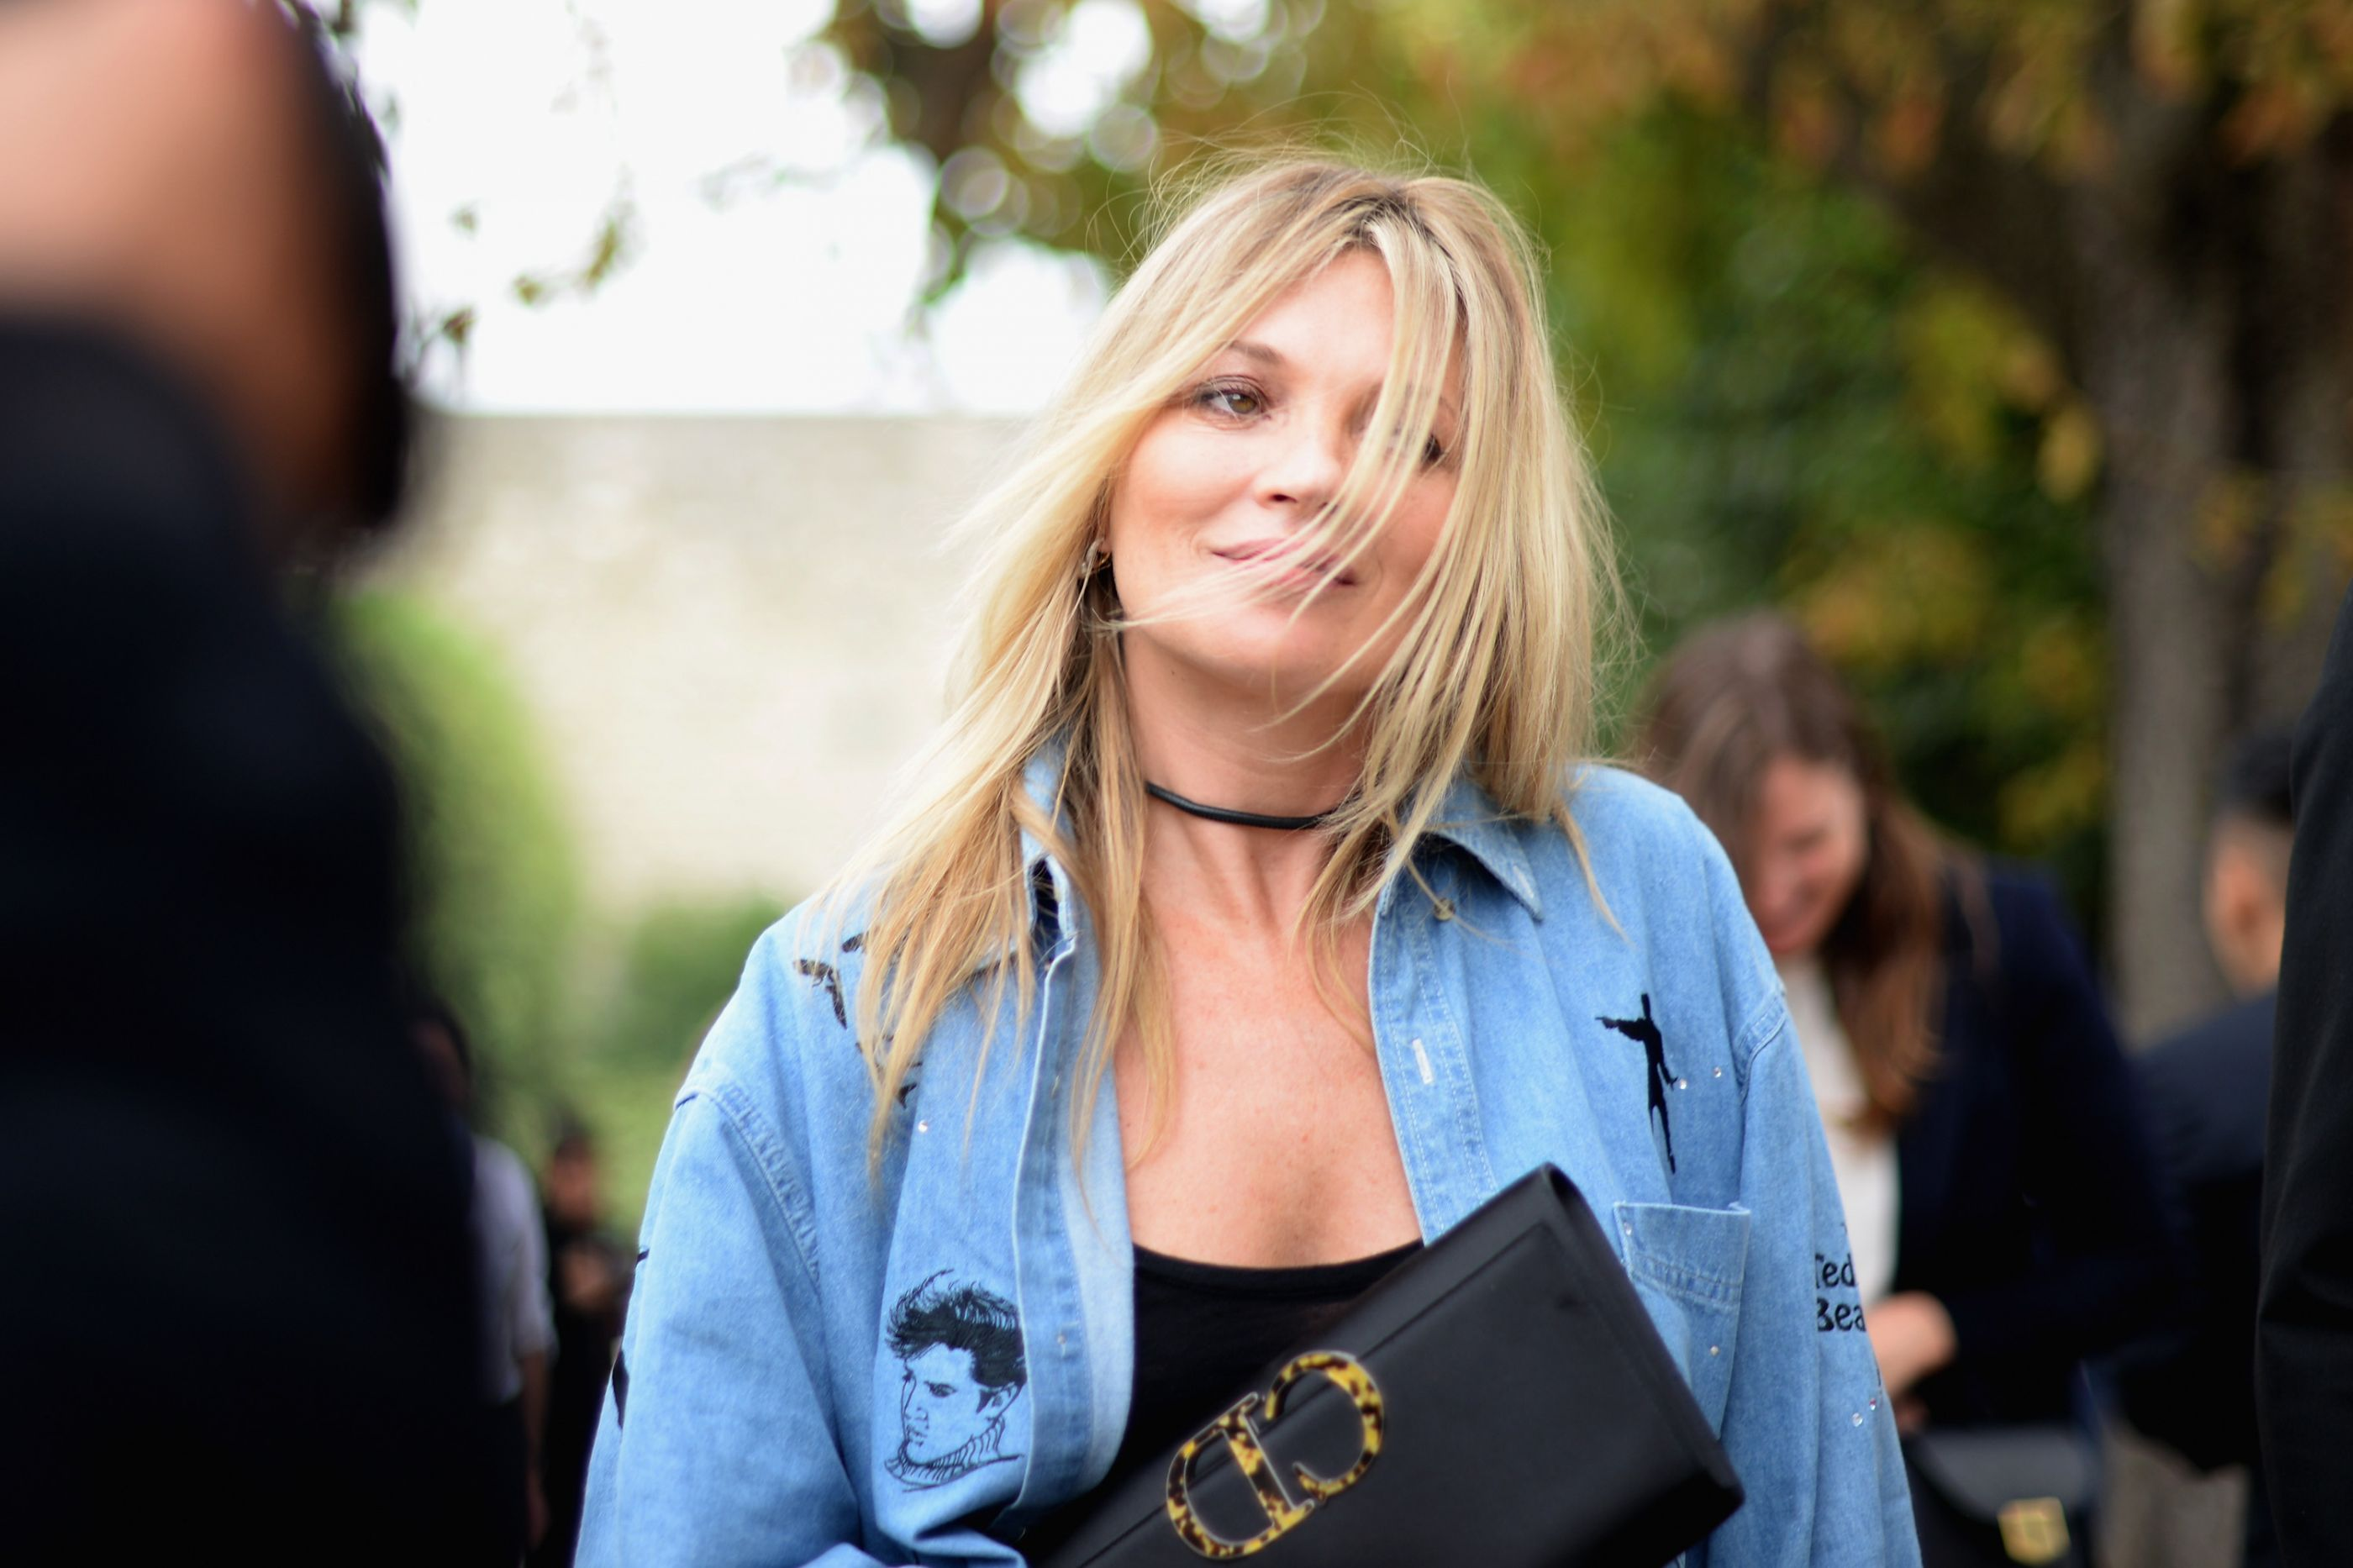 Farta da vida boémia de namorado, Kate Moss termina namoro